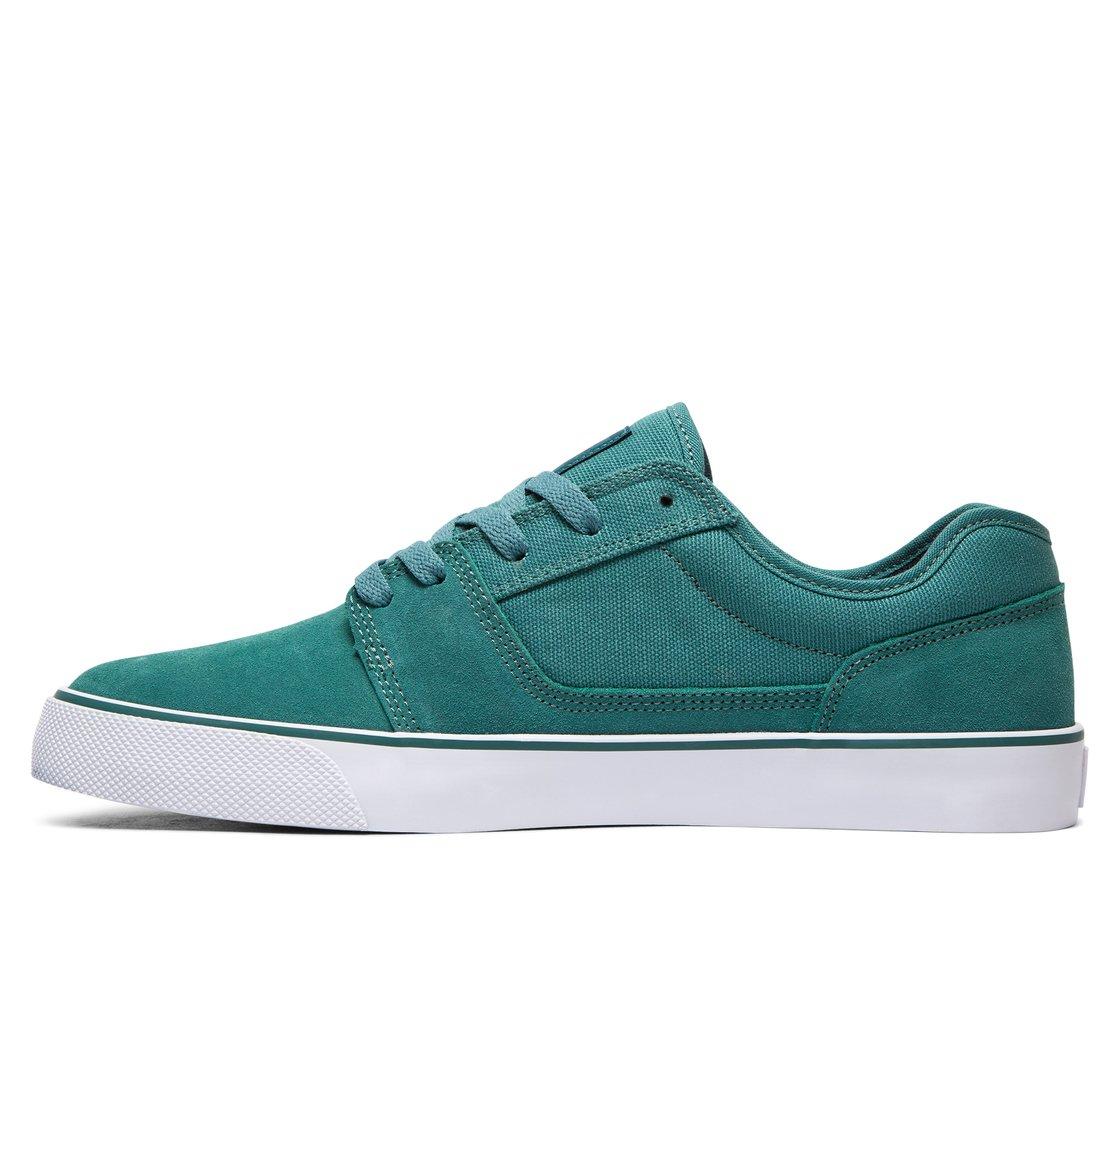 DC DC DC schuhe™ Tonik - Schuhe für Männer 302905 c32629